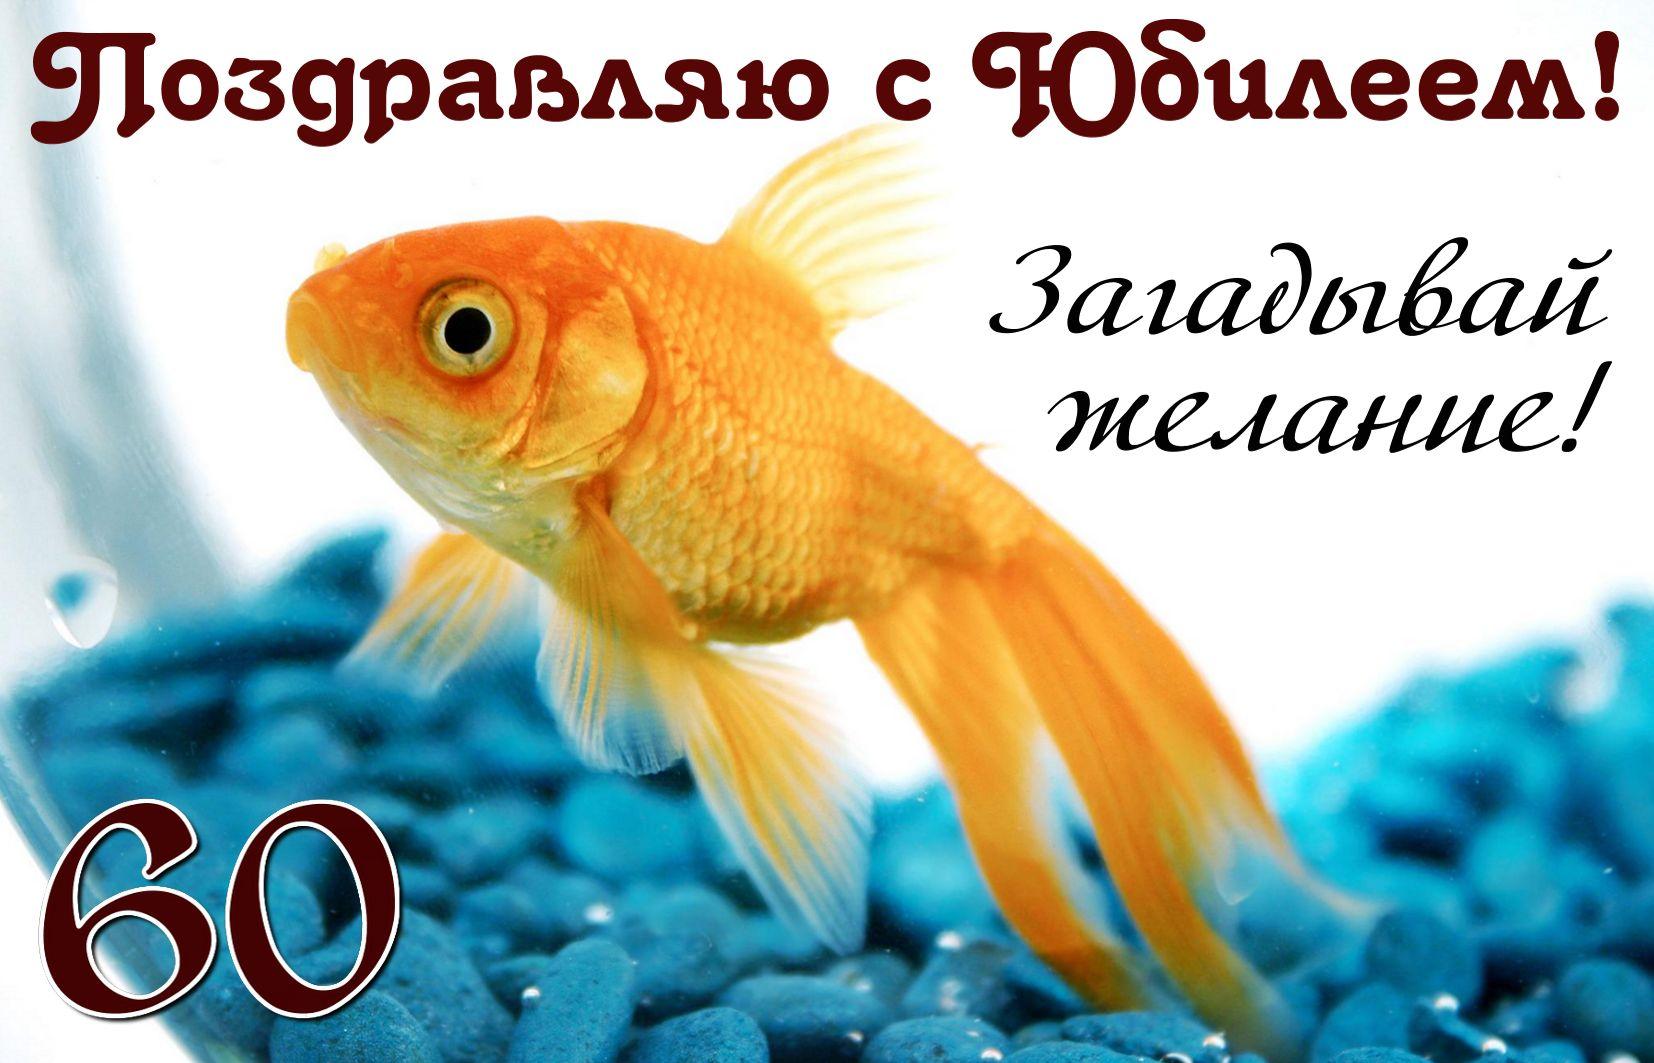 Открытка на юбилей 60 лет - золотая рыбка на фоне синих камешков